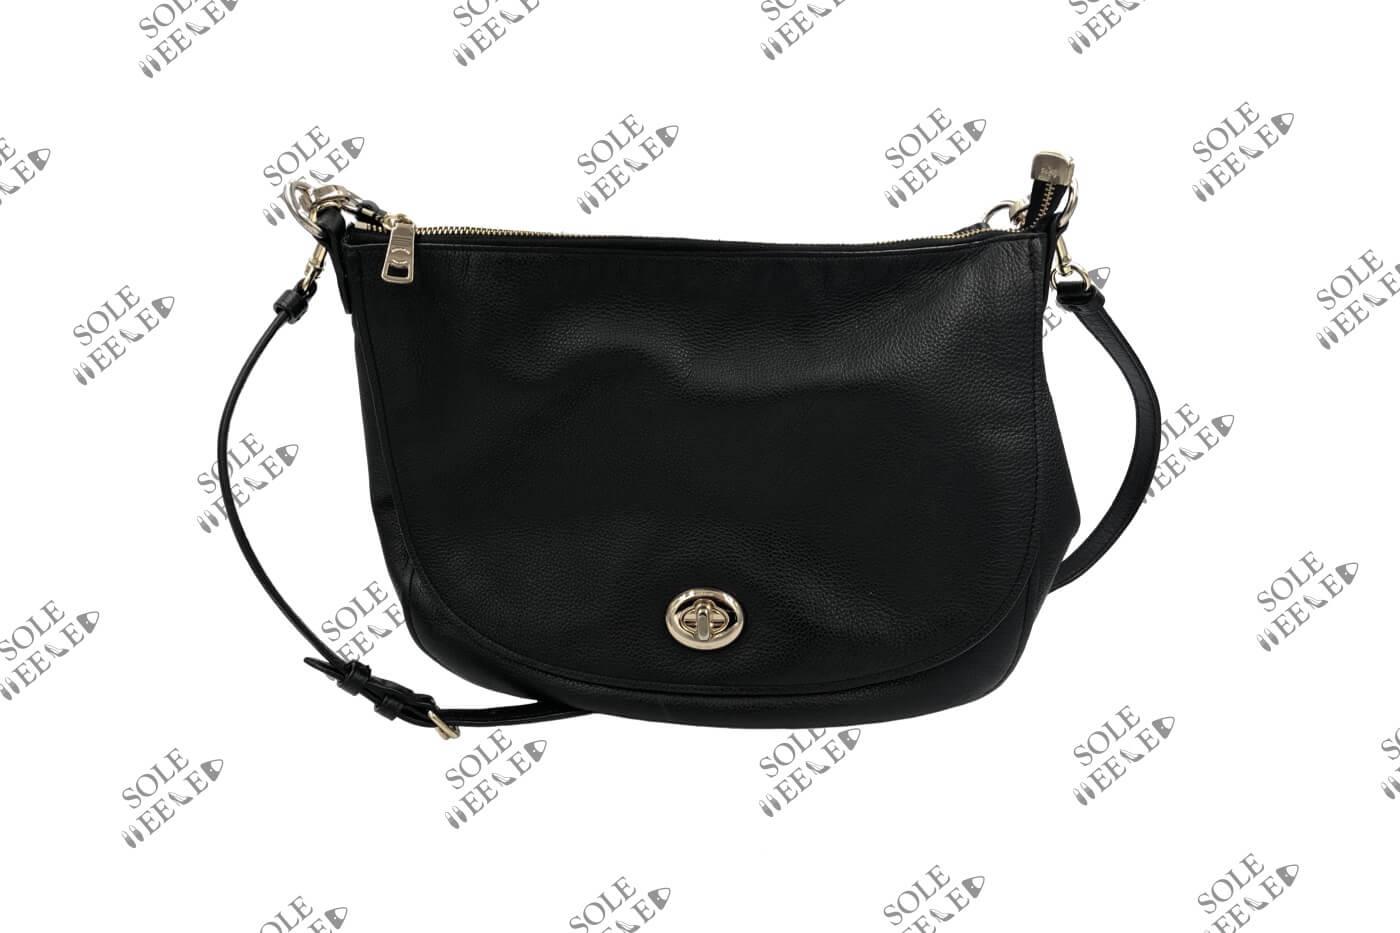 Coach Handbag Strap Repair